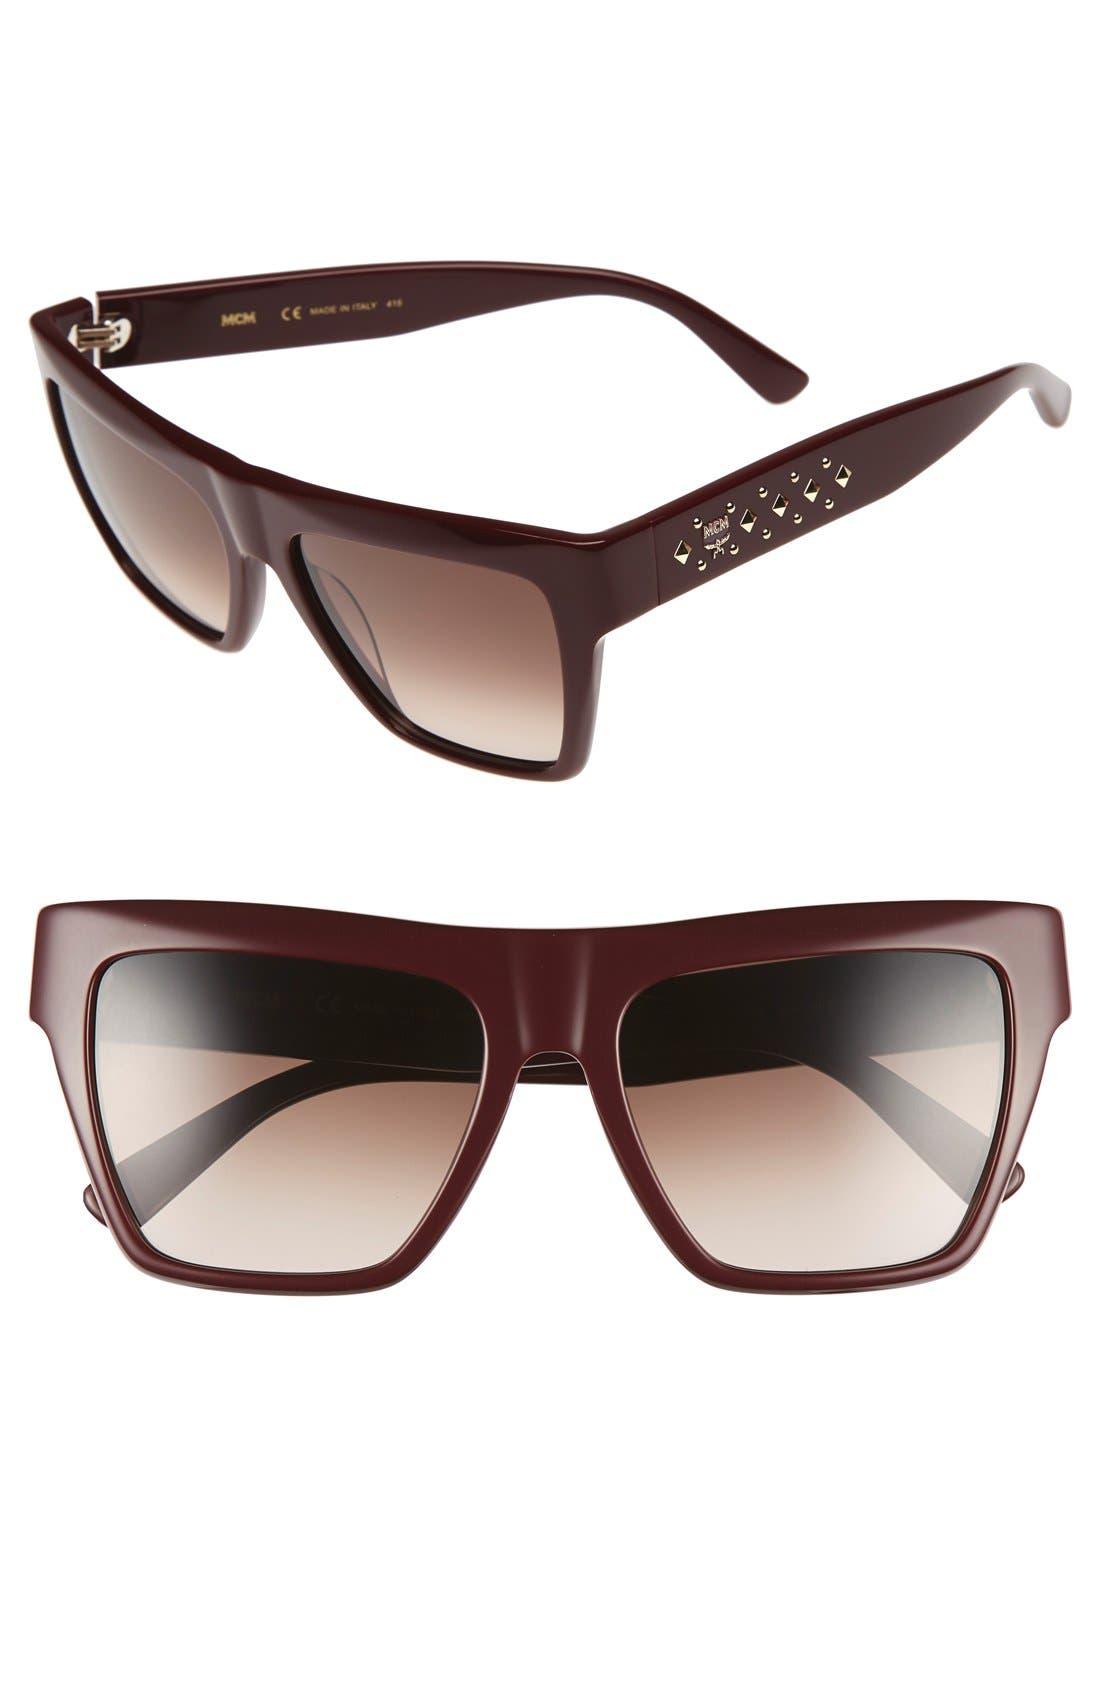 Main Image - MCM 55mm Studded Navigator Sunglasses